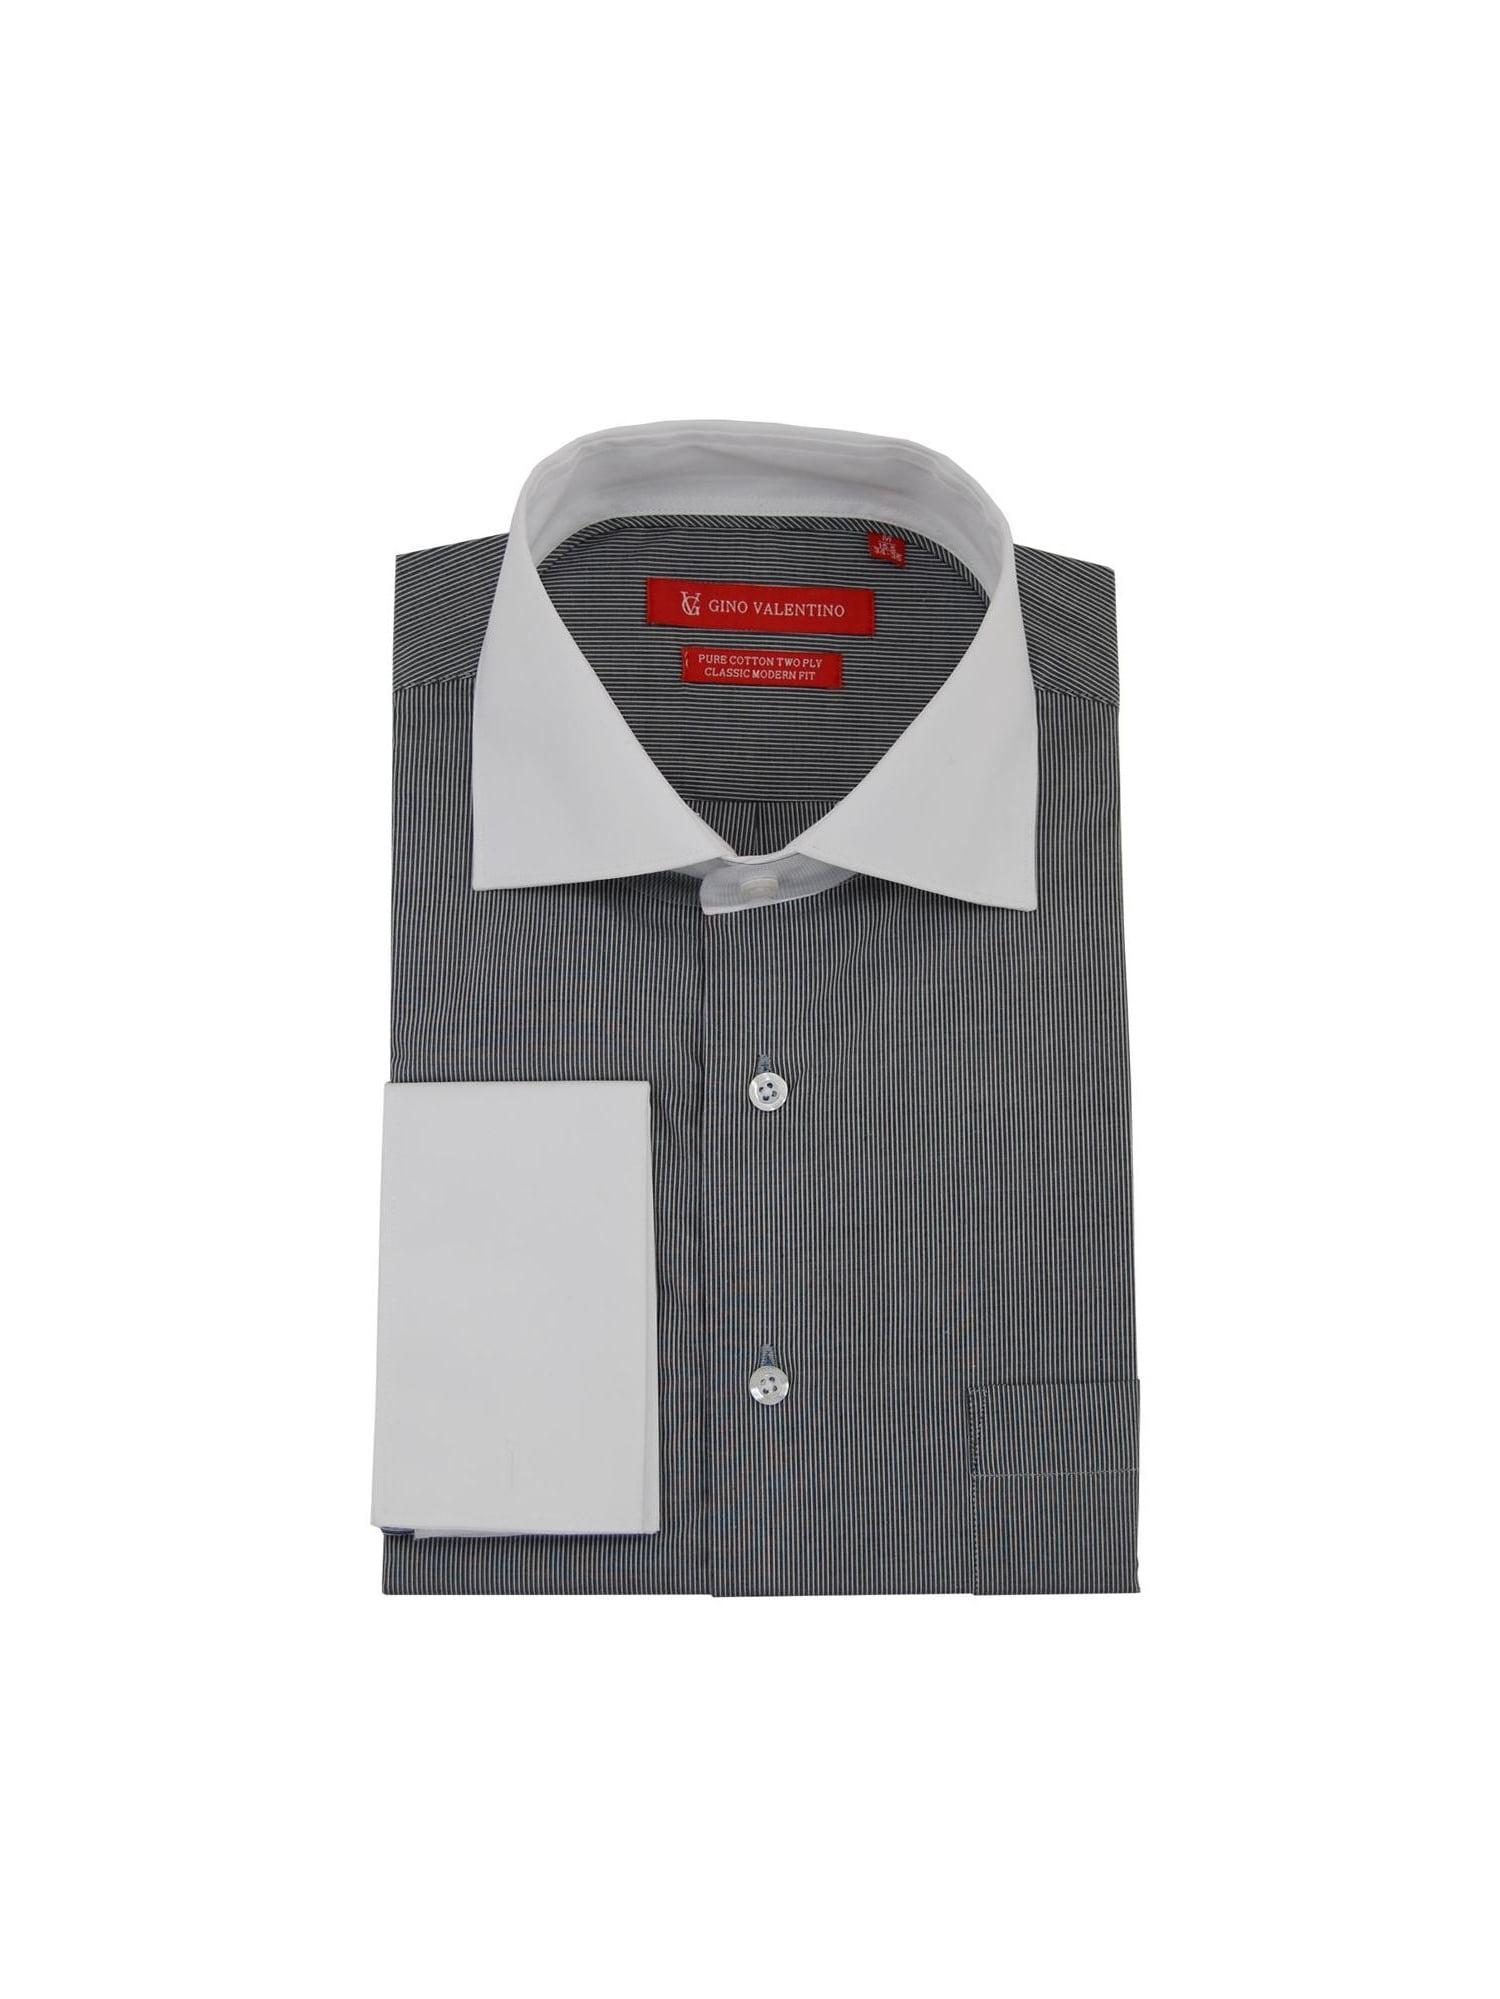 Dti Executive Dti Executive Mens Stripe Dress Shirt Cotton Spread